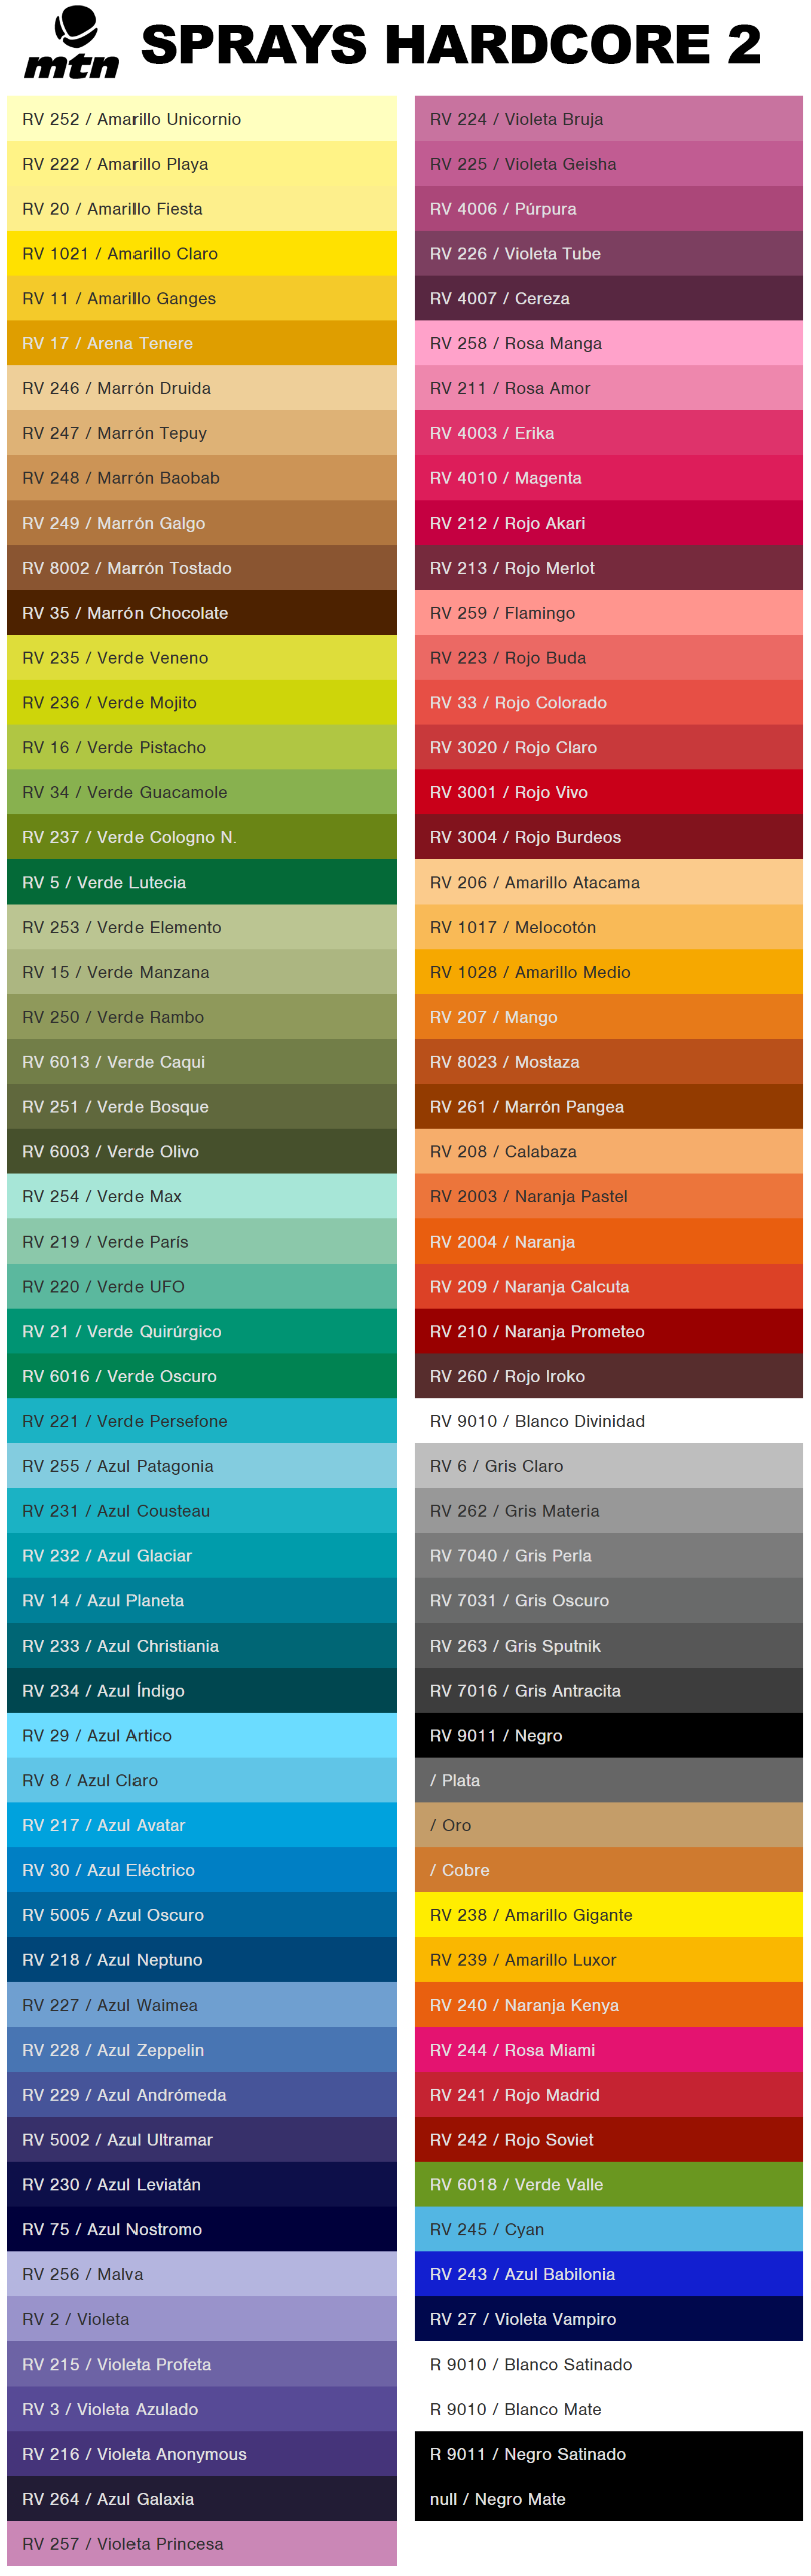 Carta de colores sprays HARDCORE 2